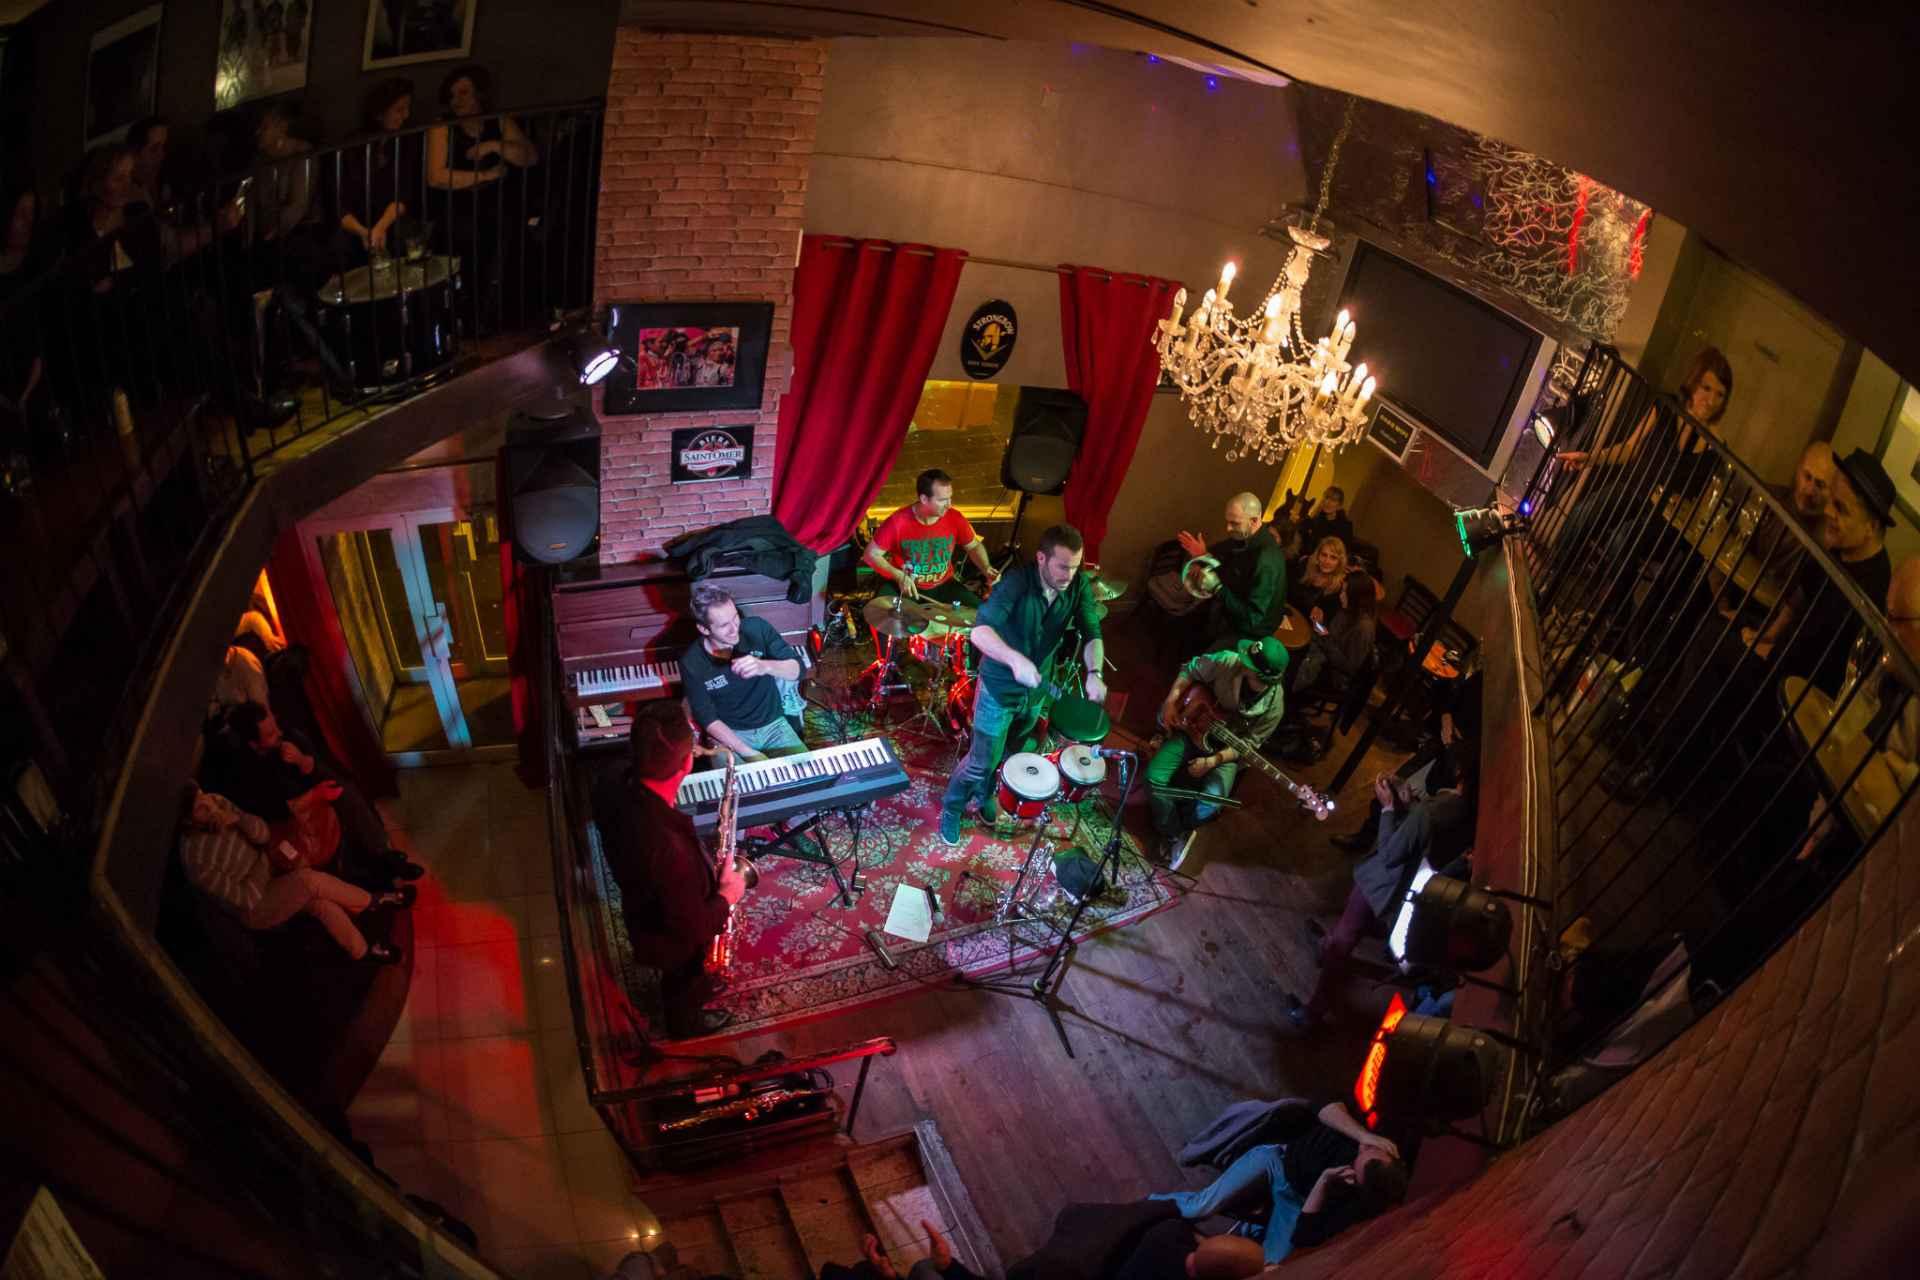 band-playing-music-in-dark-jazz-bar-le-shapko